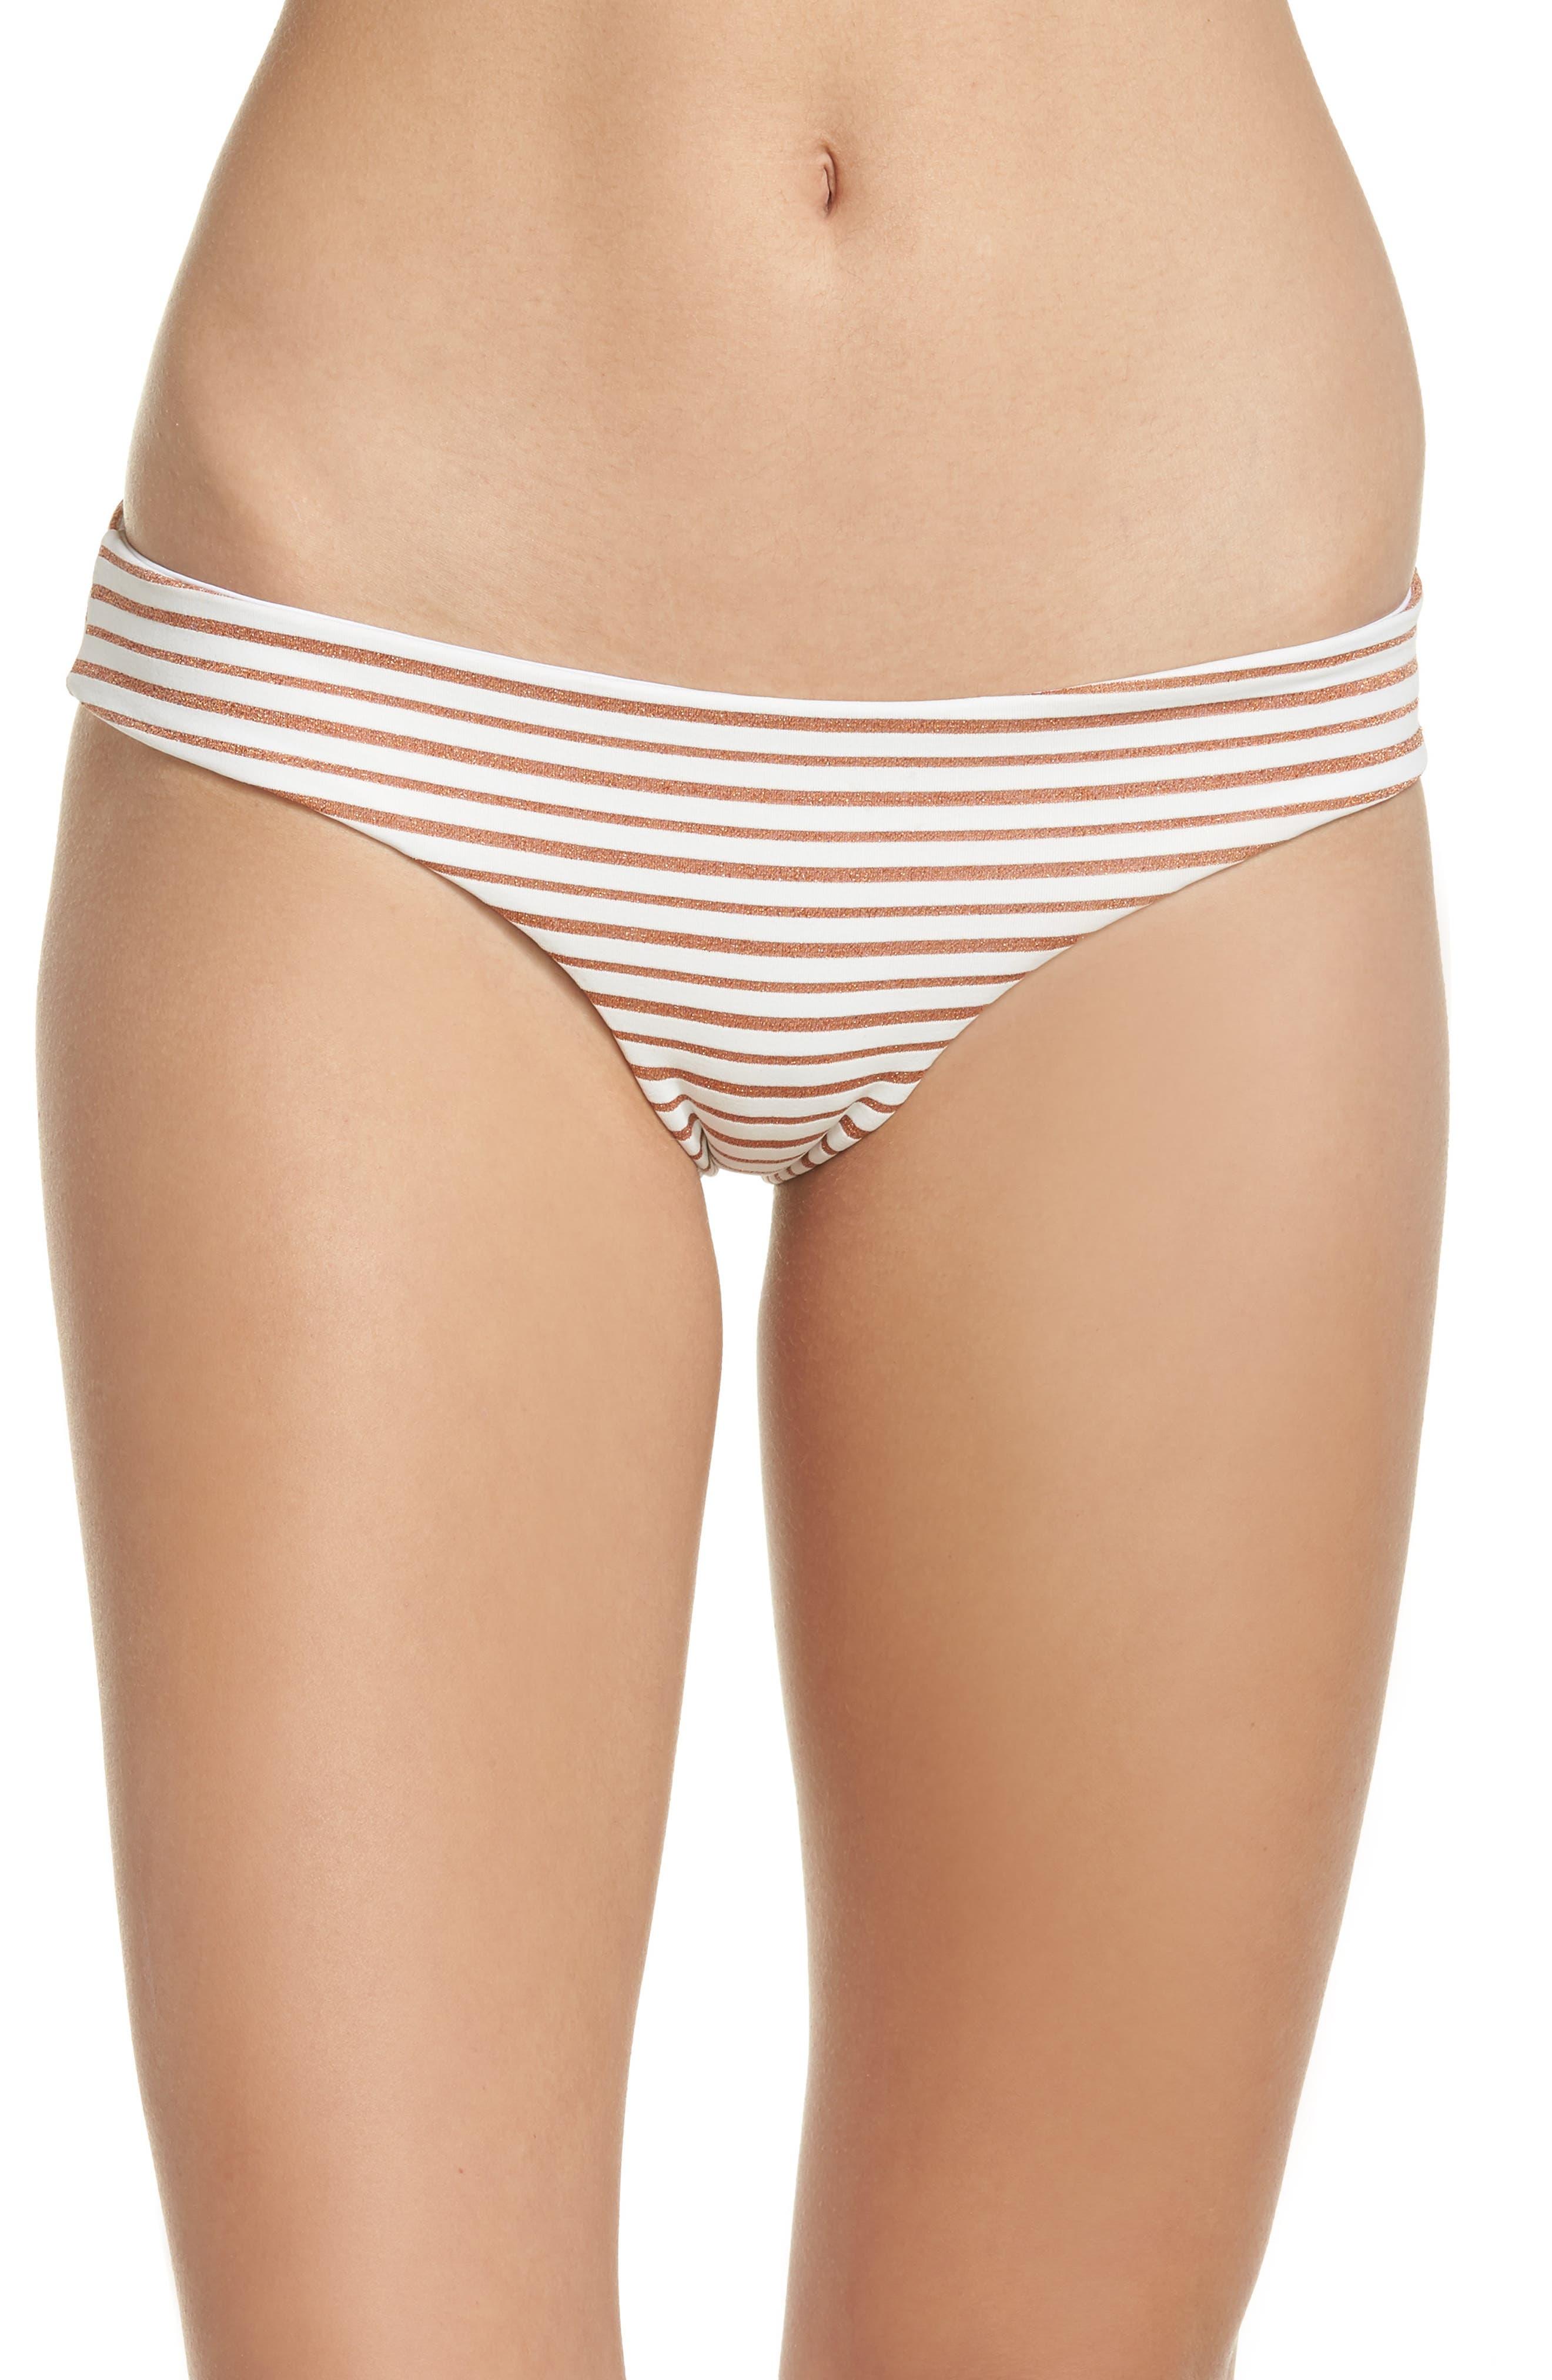 L SPACE Sandy Stripe Bikini Bottoms, Main, color, 100